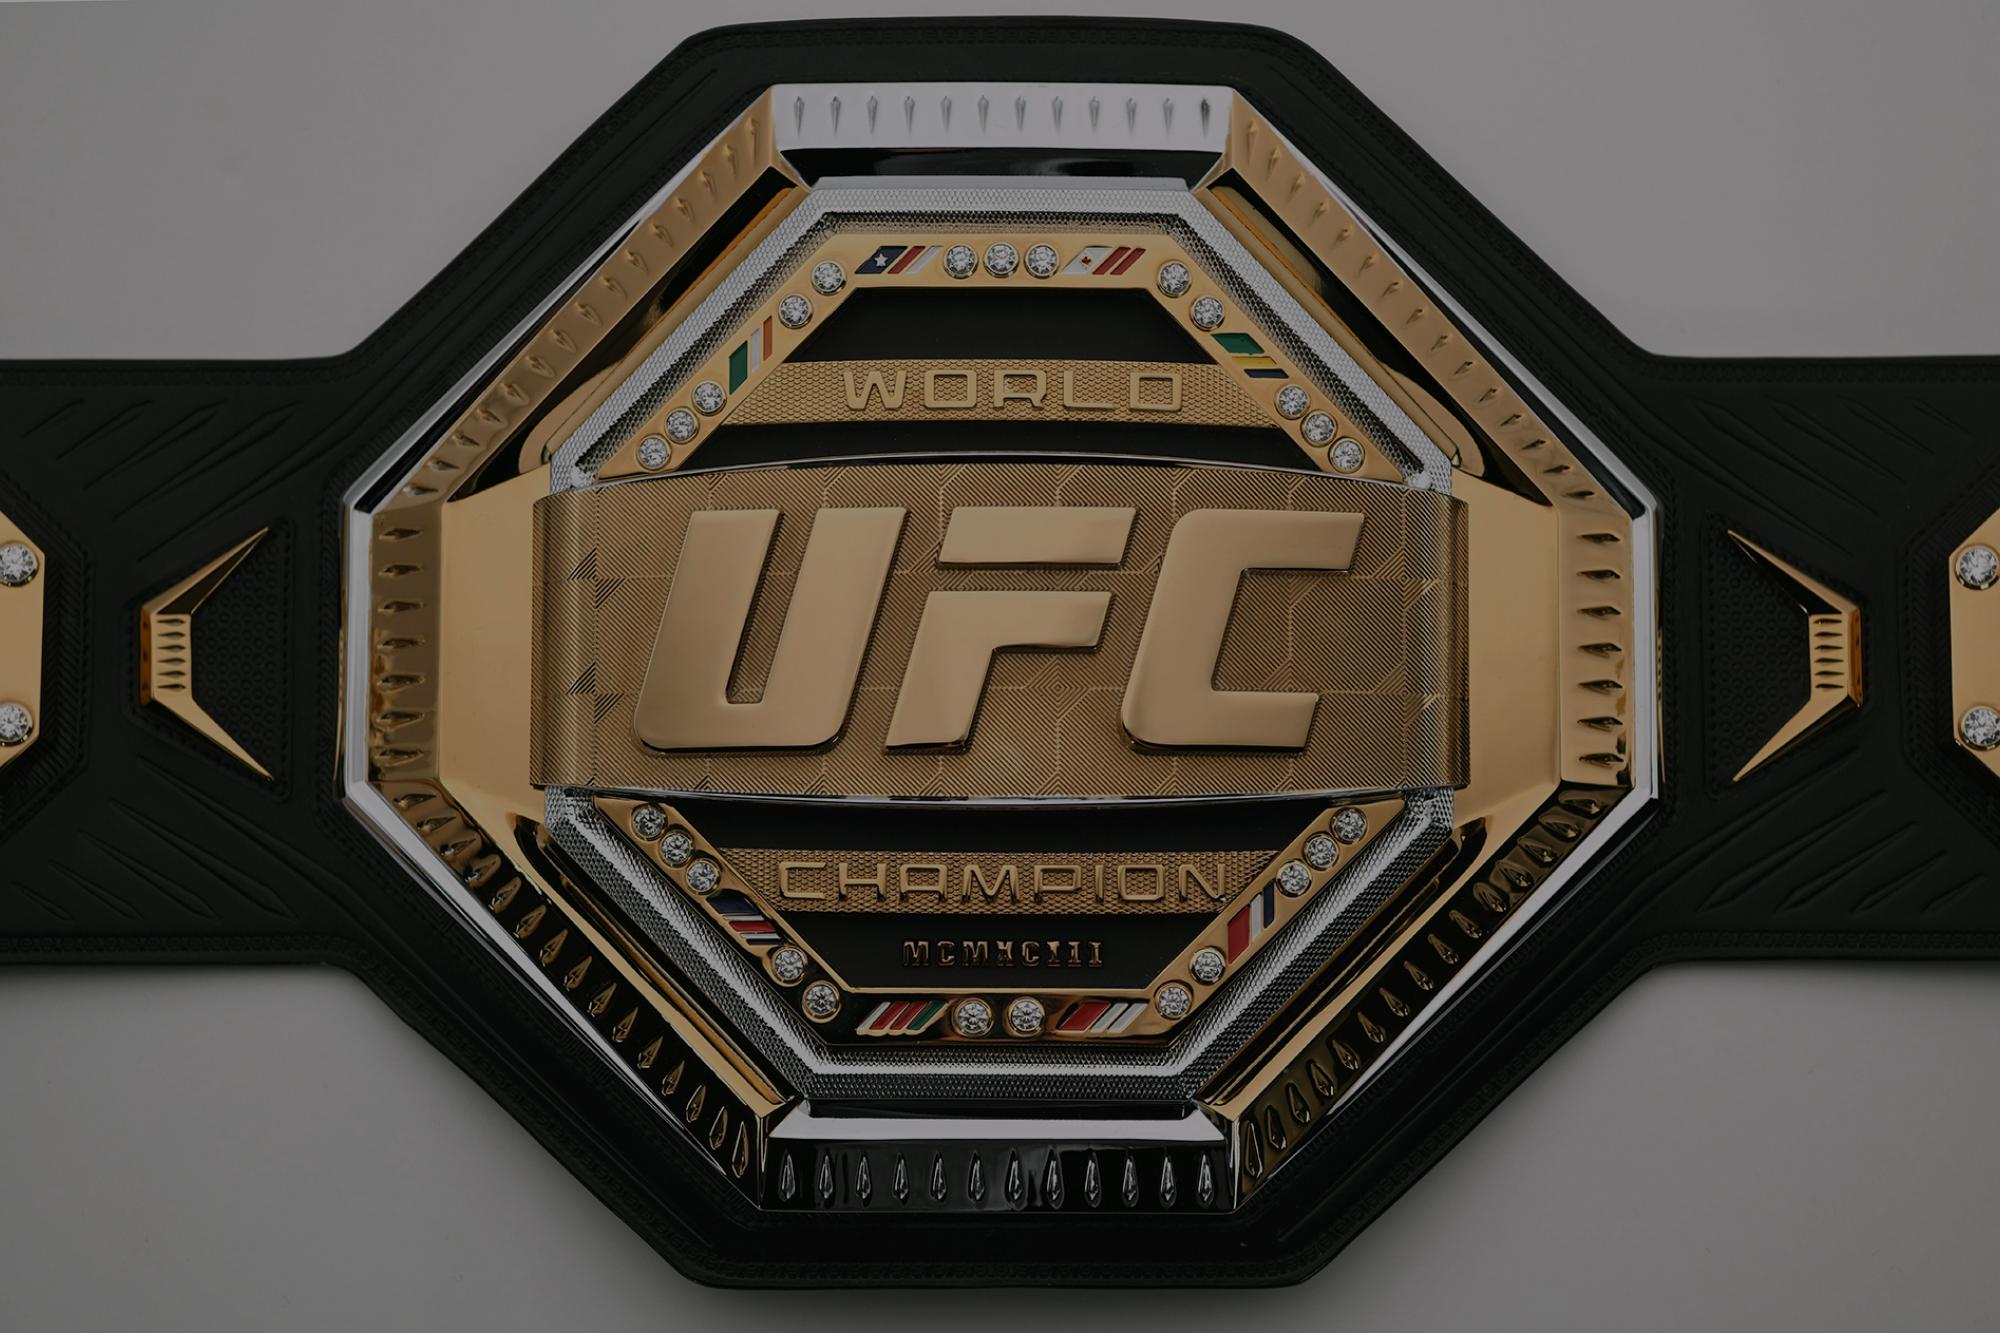 Introducing The Ufc Legacy Championship Belt Ufc